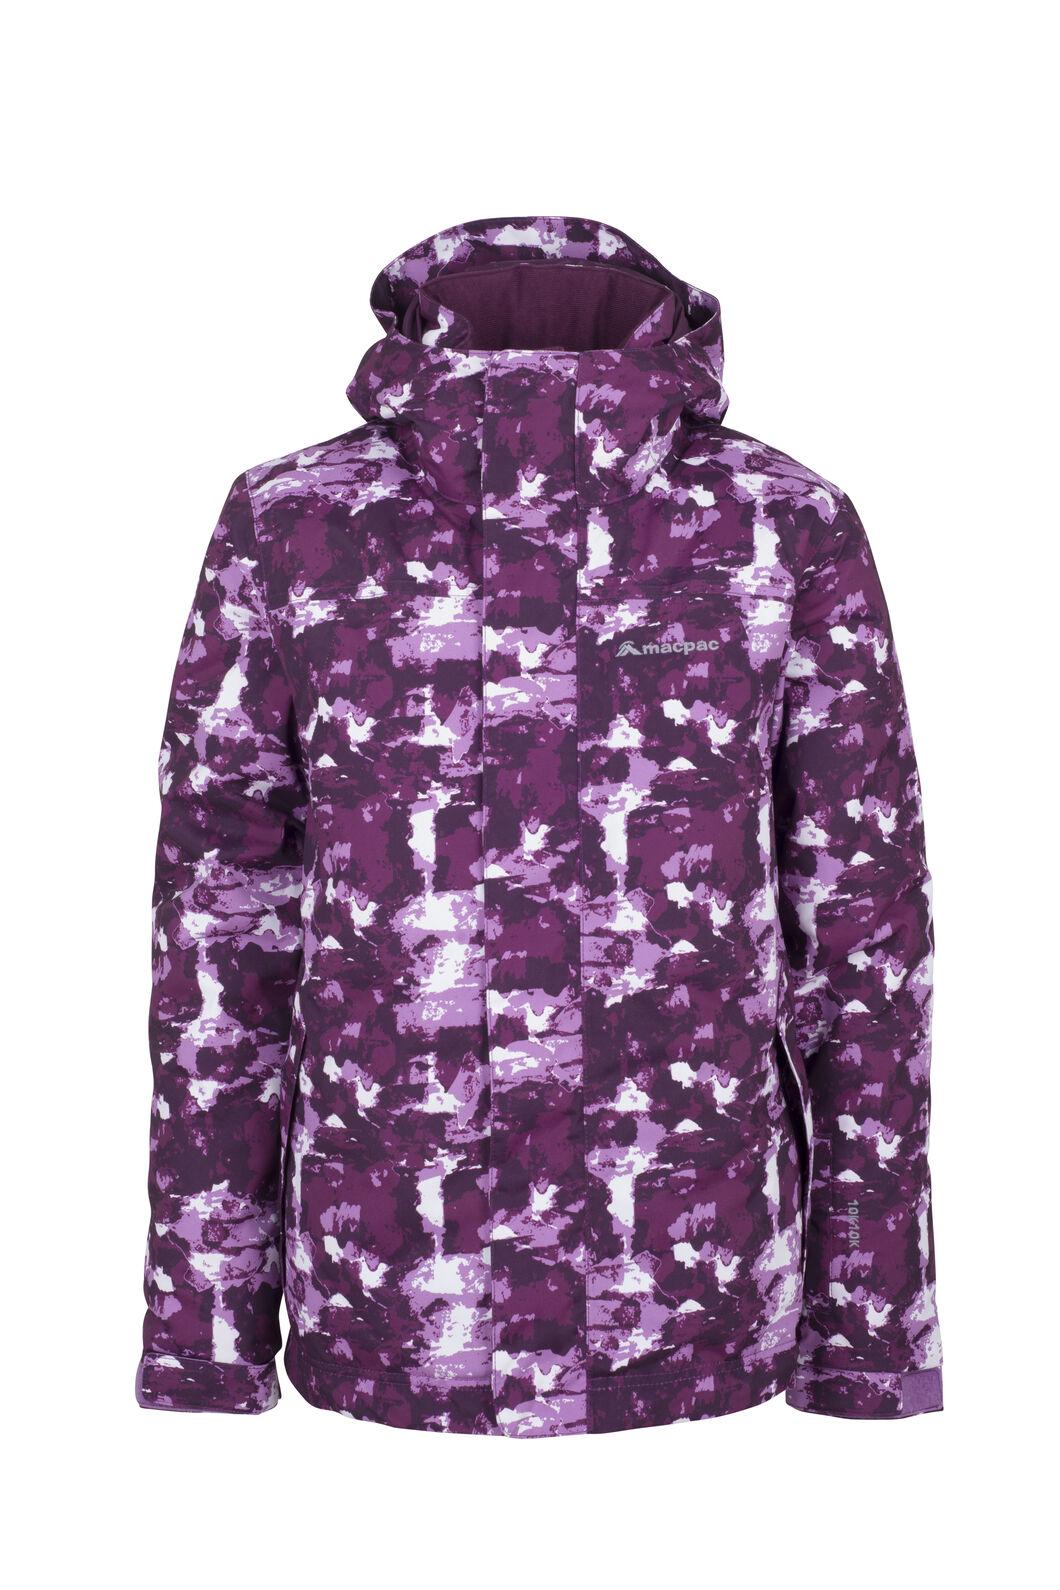 Macpac Spree Ski Jacket - Kids', Purple Print, hi-res